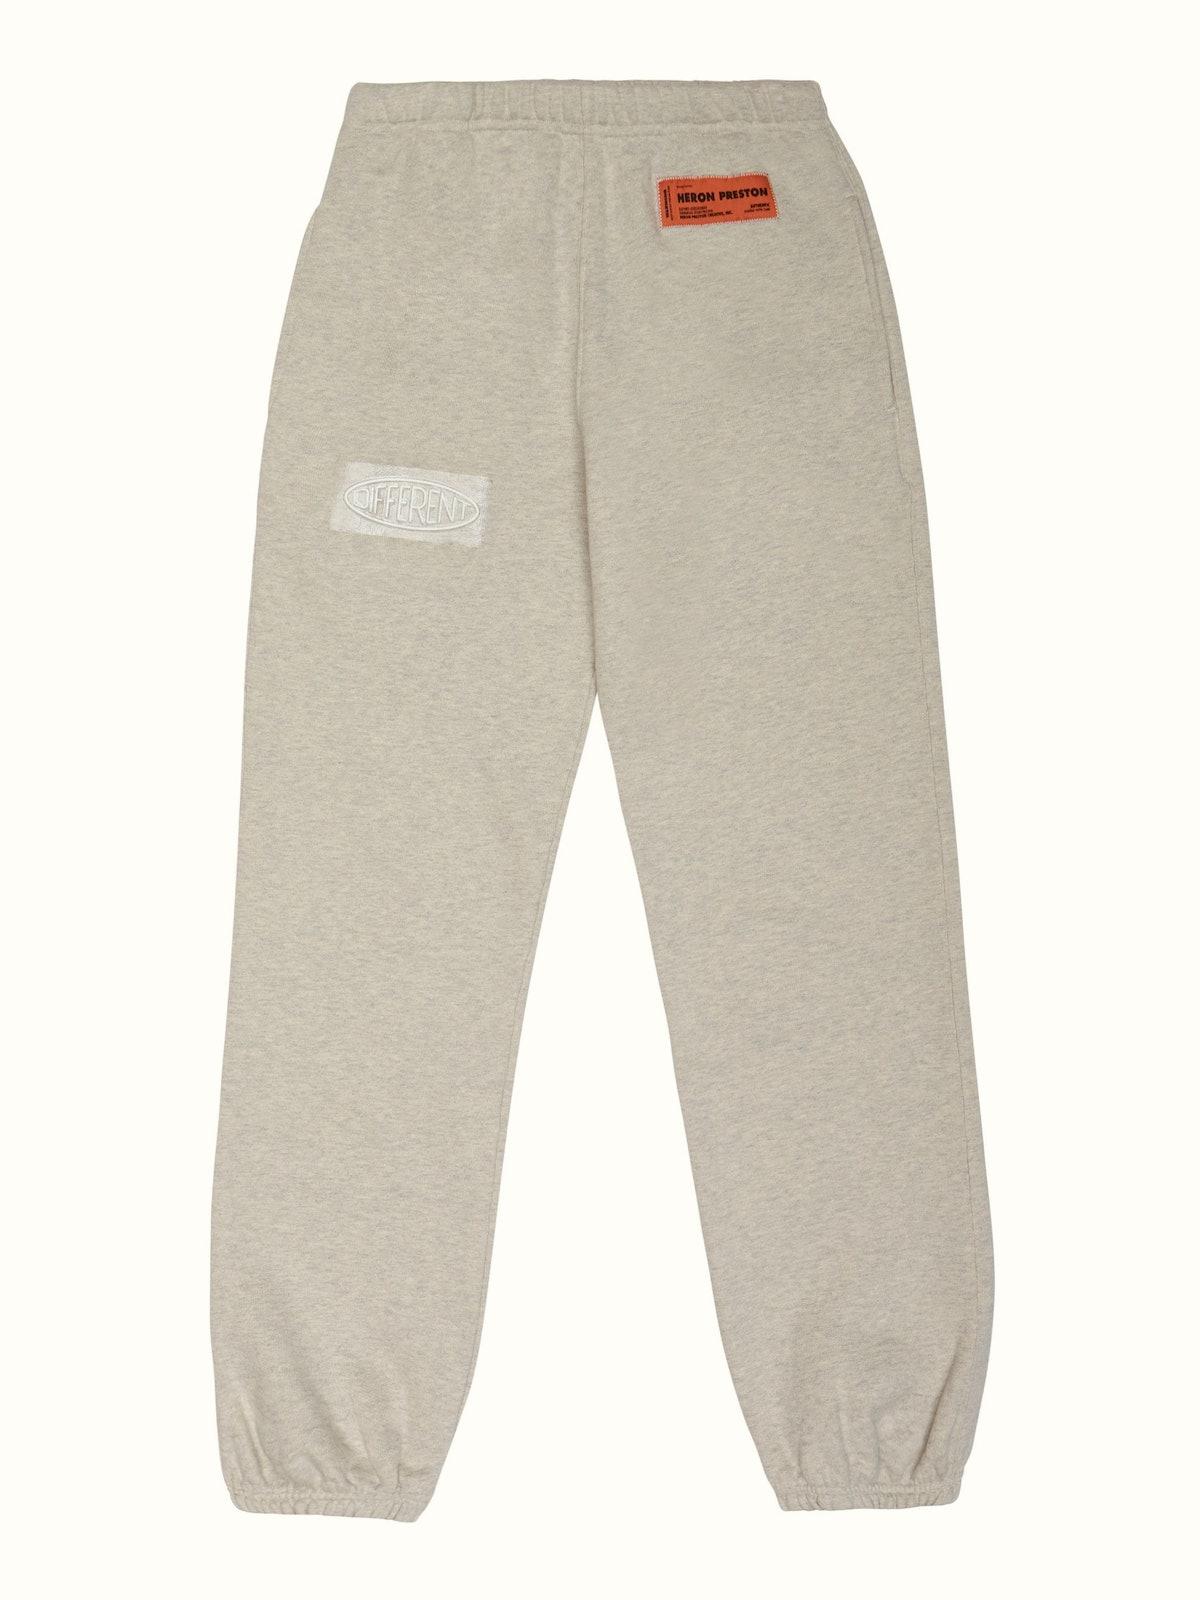 Different Oversized Sweatpants from Heron Preston.